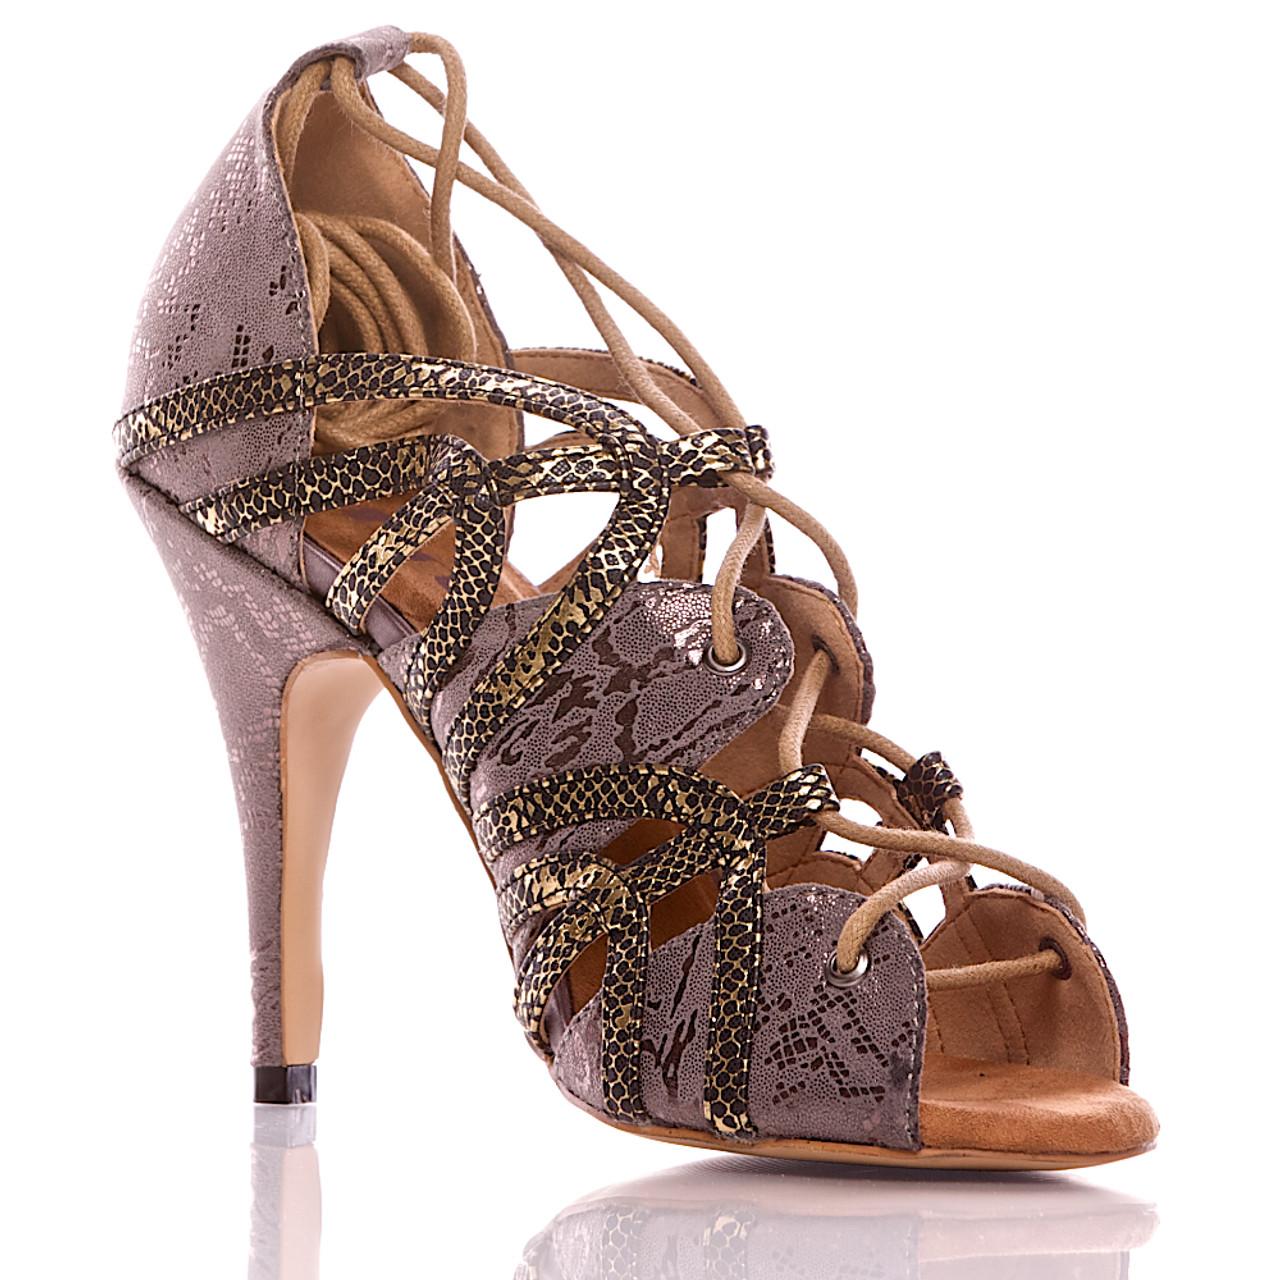 121a6bd9dcbf Vaneno - Grey And Black Open Toe Lace Up Stiletto Sandal - 4 inch Heels - Burju  Shoes